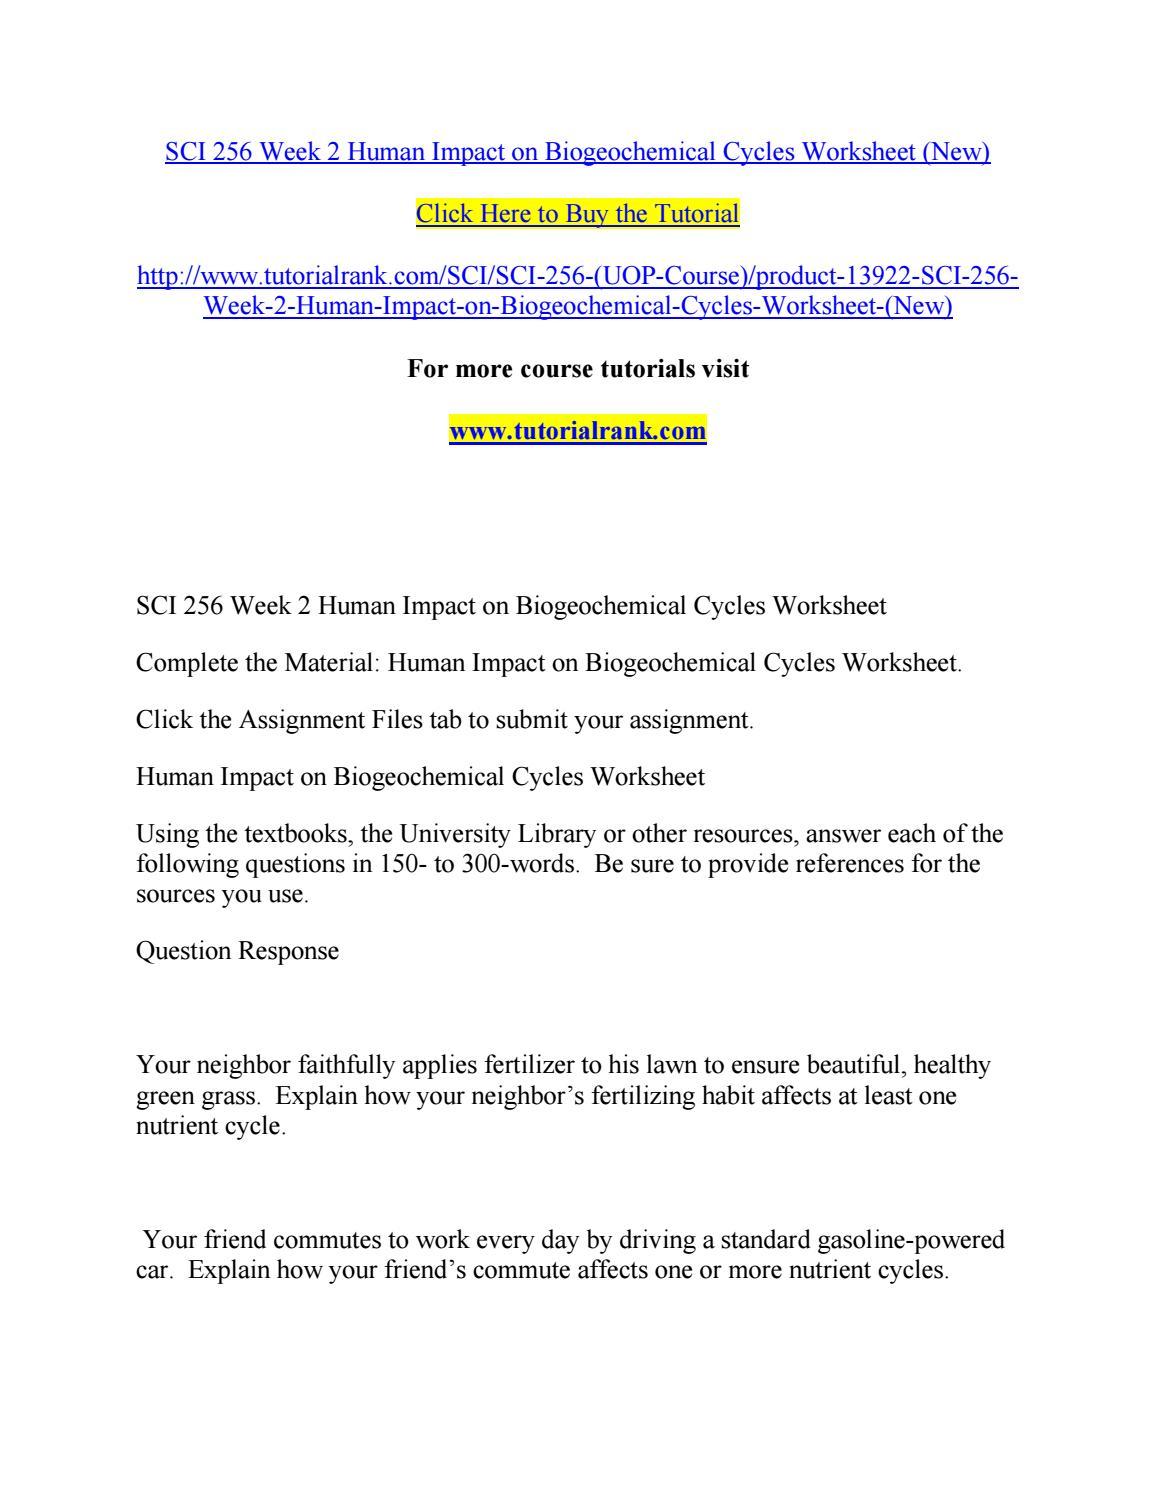 Sci 256 Week 2 Human Impact On Biogeochemical Cycles